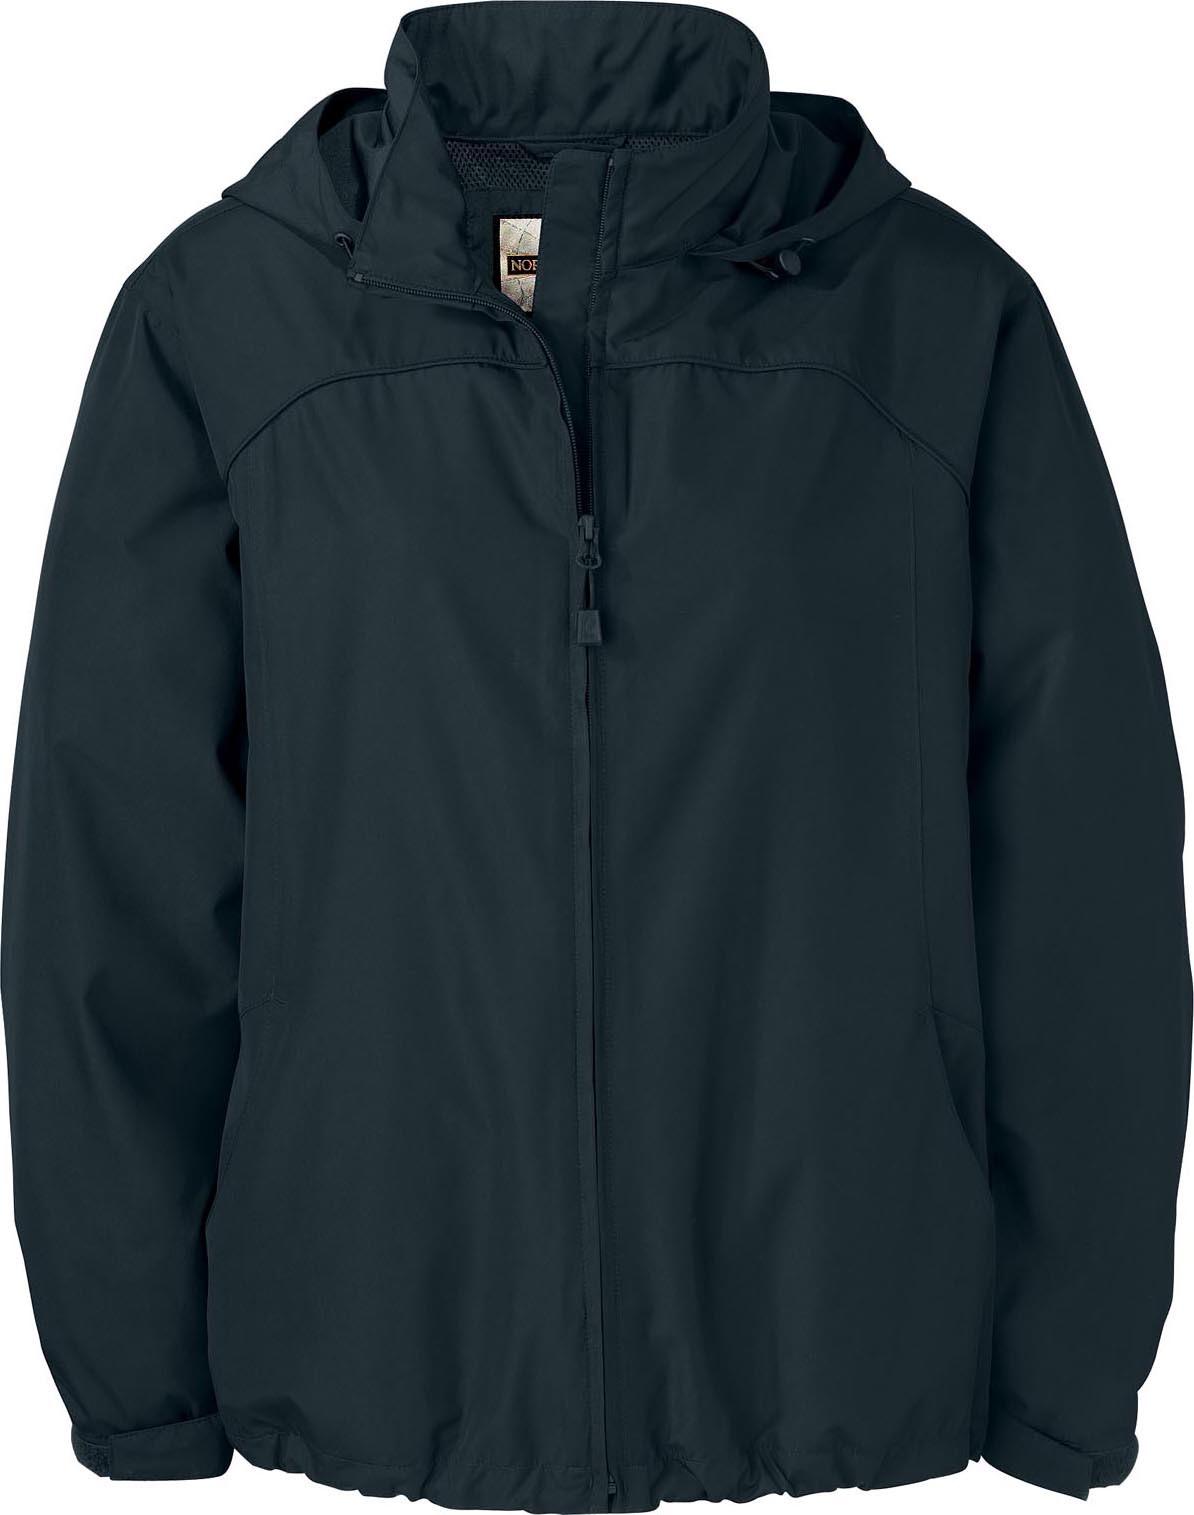 Ash City Lightweight 78032 - Ladies' Techno Lite Jacket